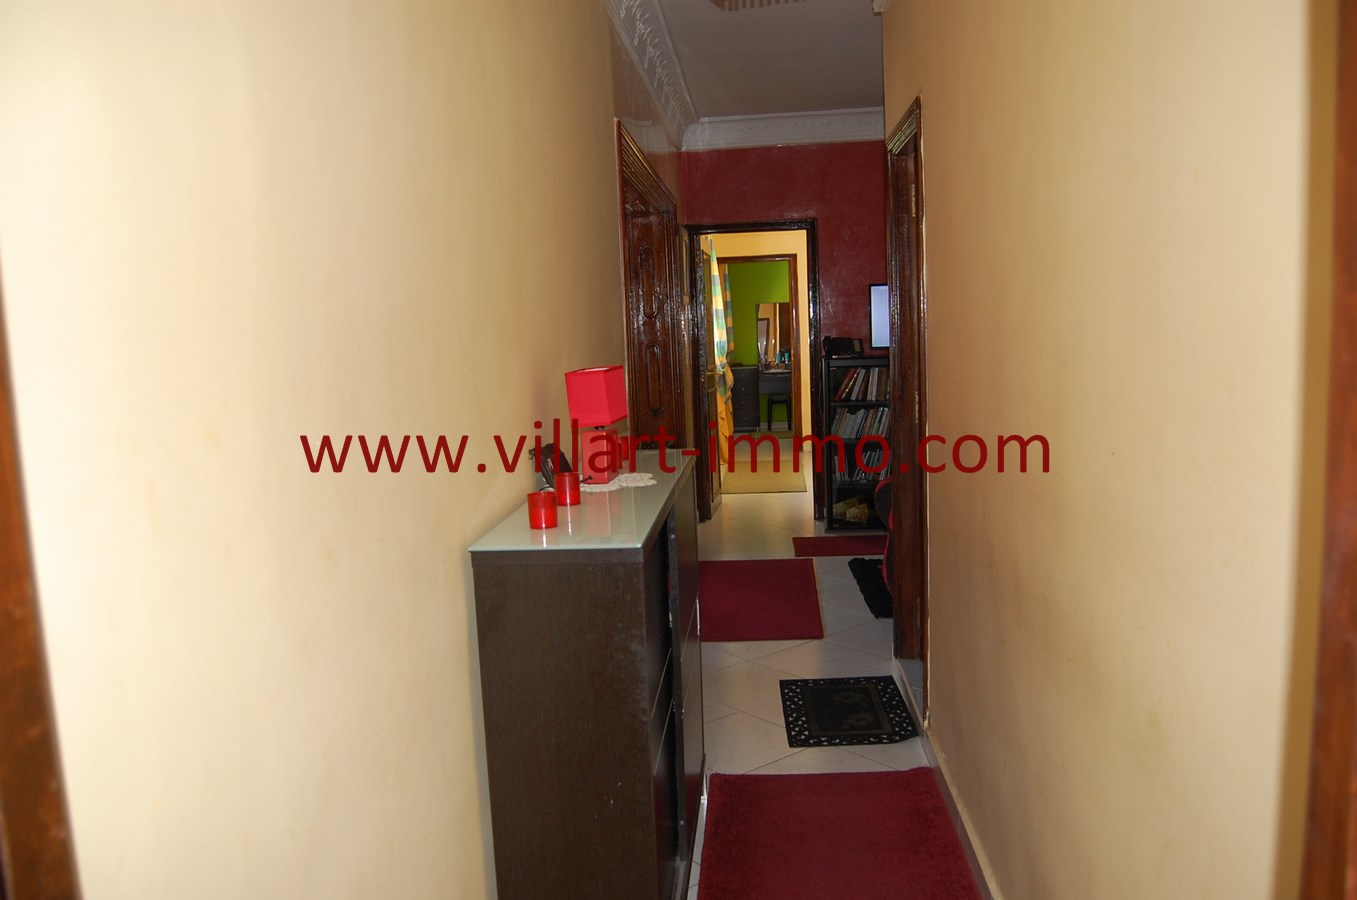 7-Vente-Appartement-Tanger-Centre-Ville-Couloir-VA505-Villart Immo